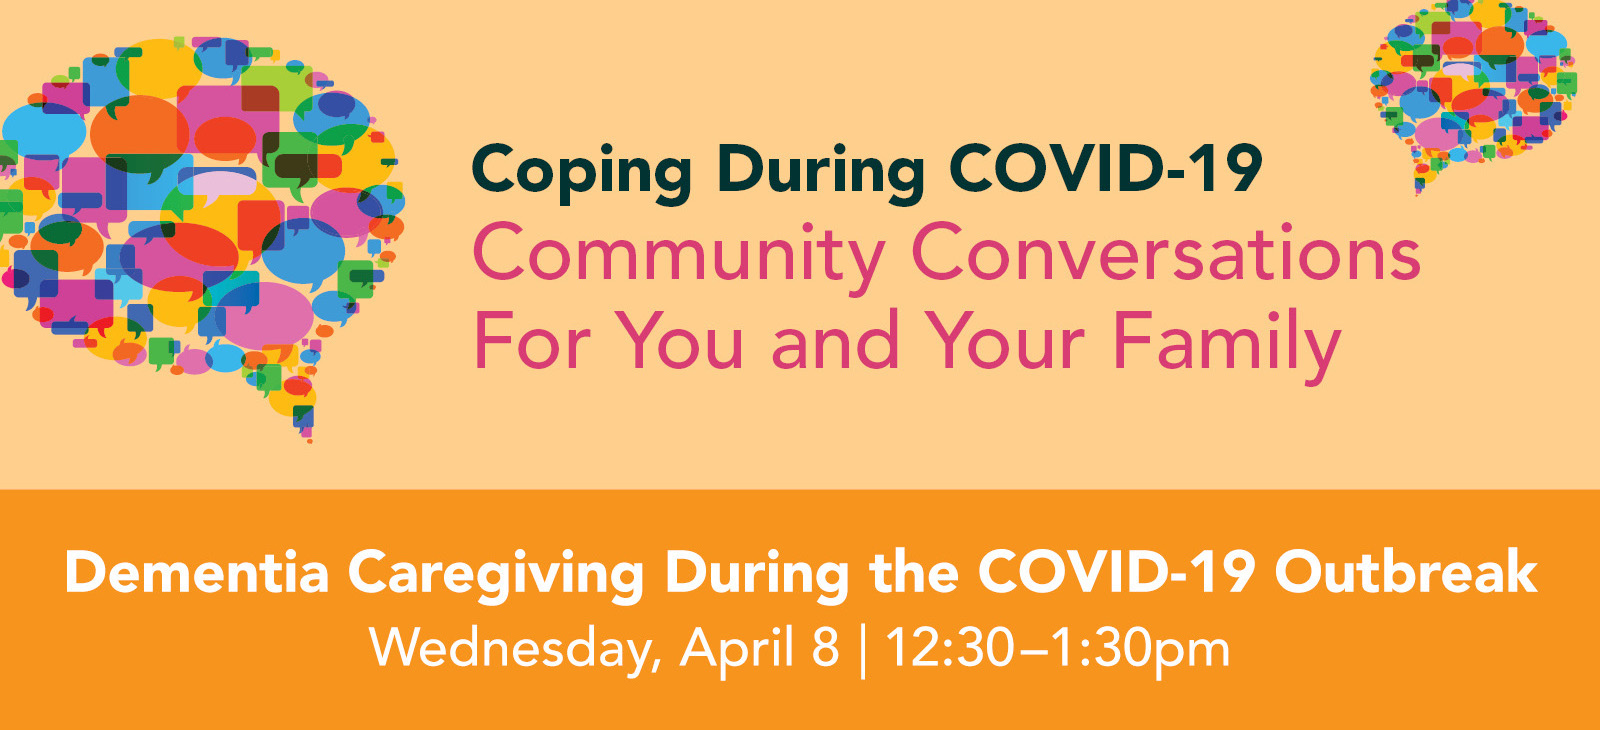 Dementia Caregiving During the Covid-19 Outbreak graphic